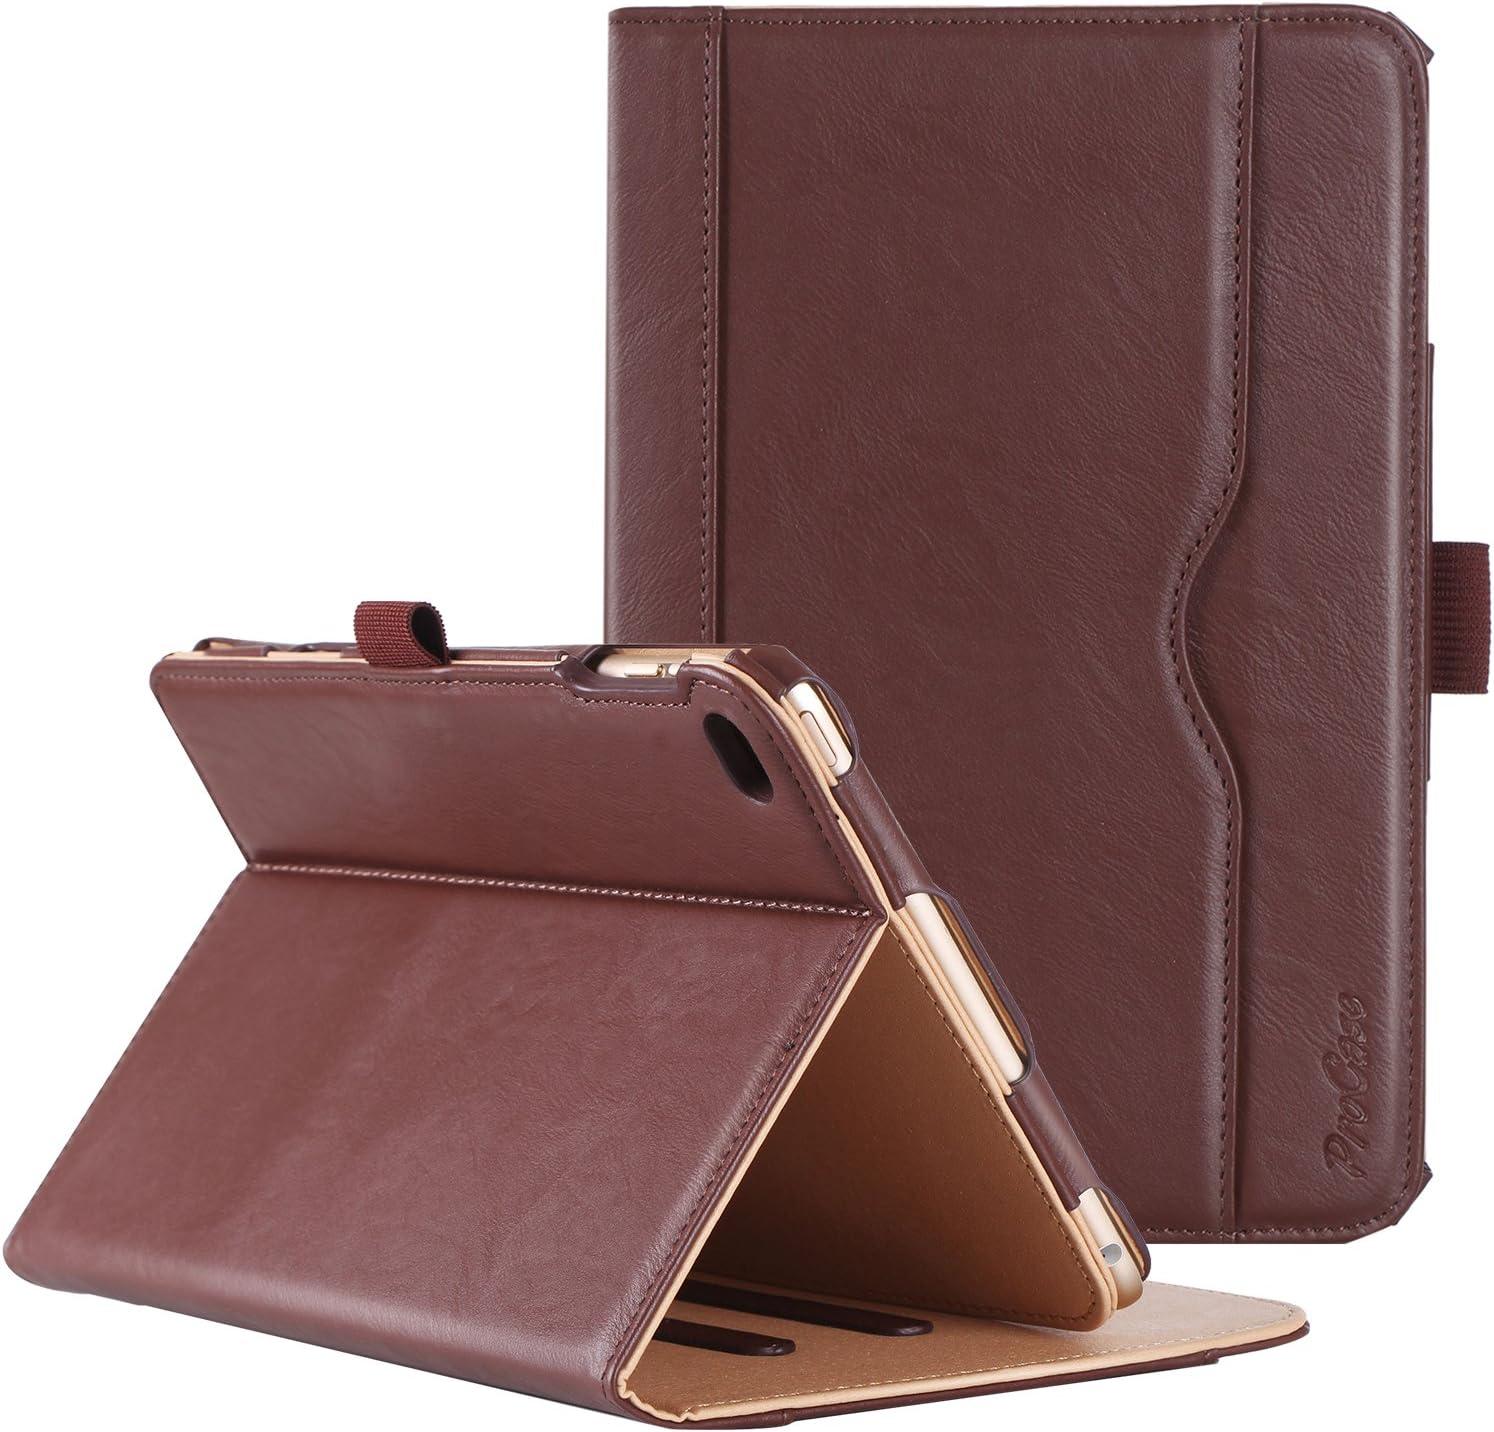 ProCase iPad Mini 4 Case - Leather Stand Folio Case Cover for 2015 Apple iPad Mini 4 (4th Generation iPad Mini, mini4), with Multiple Viewing Angles, auto Sleep/Wake, Document Card Pocket (Brown)